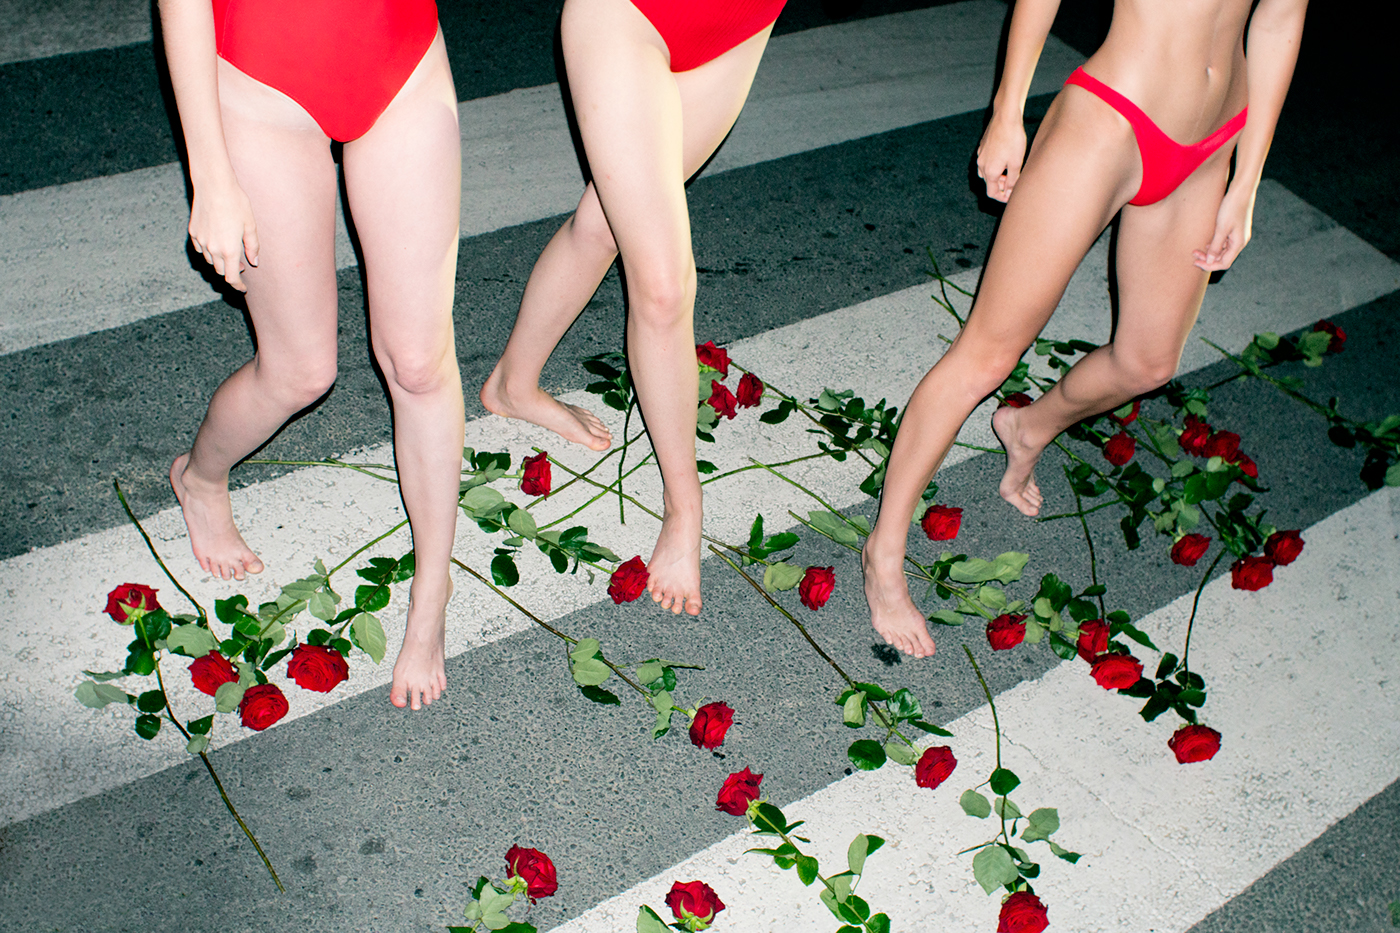 King's Flower для K MAG / фотограф Andrew Tarnawczyk